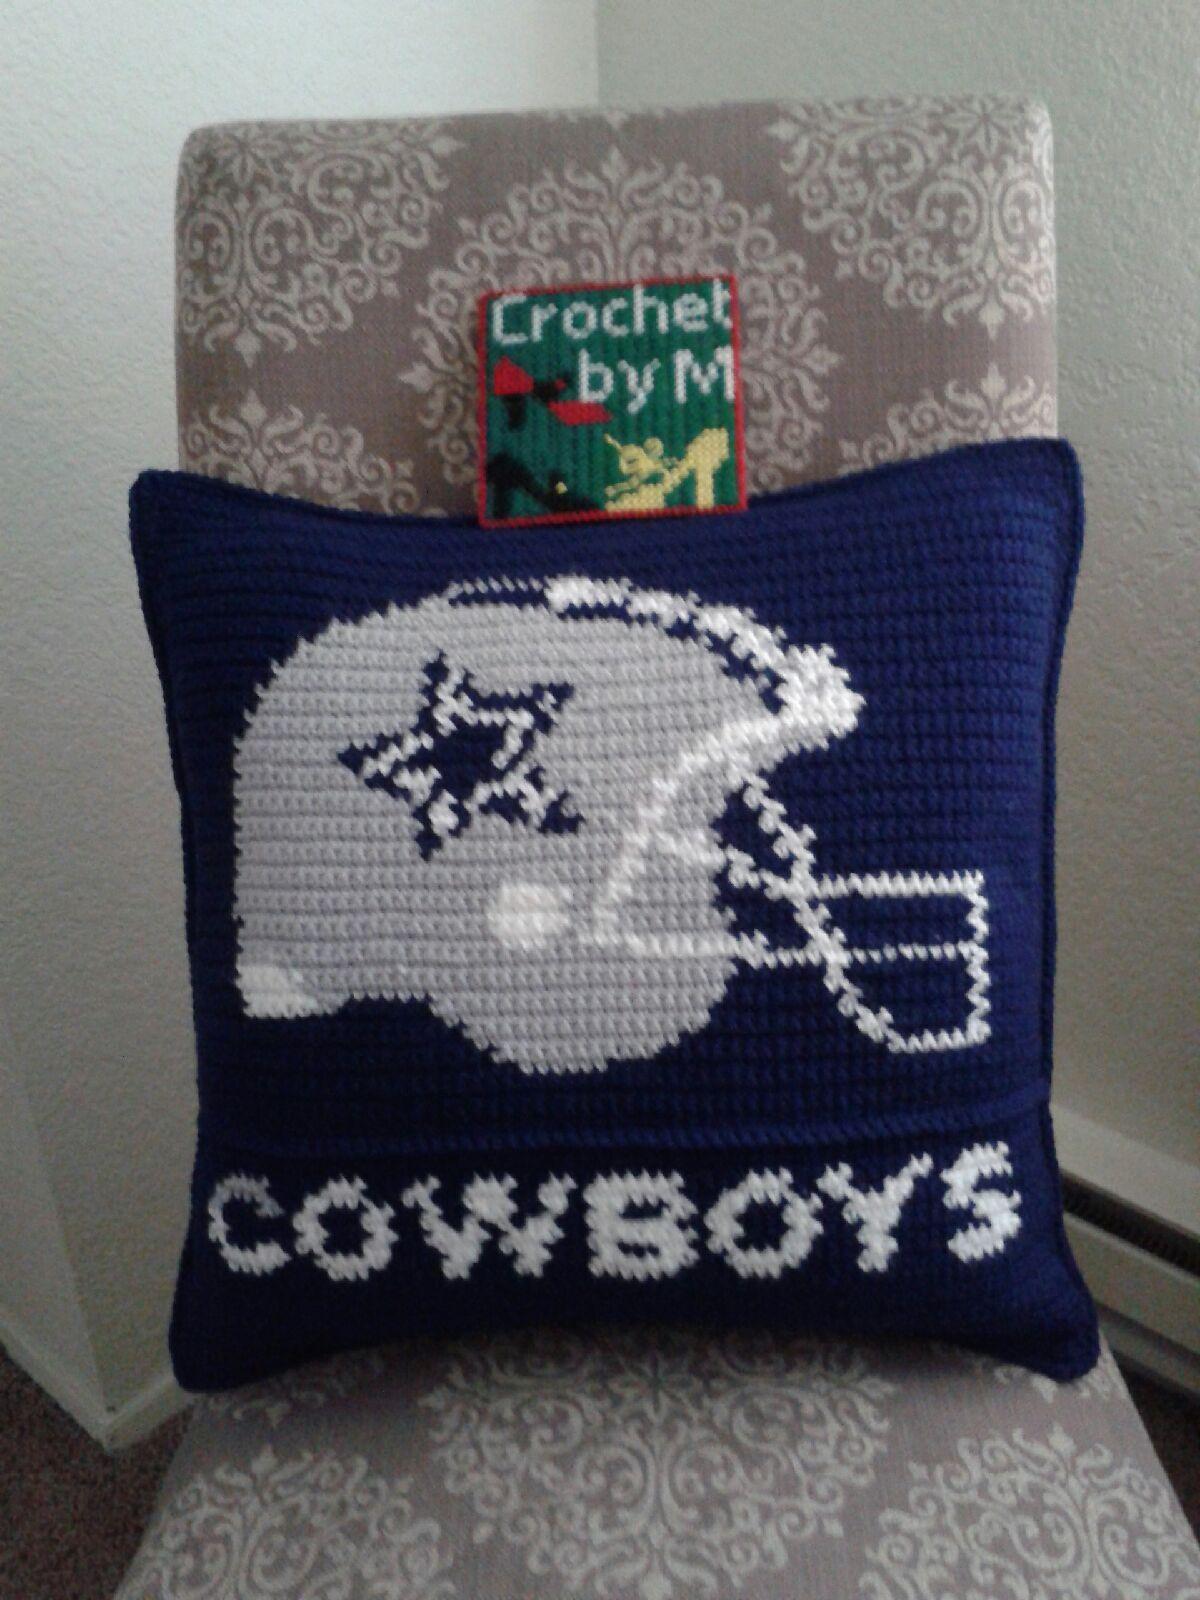 crochet dallas cowboys pillow cushion